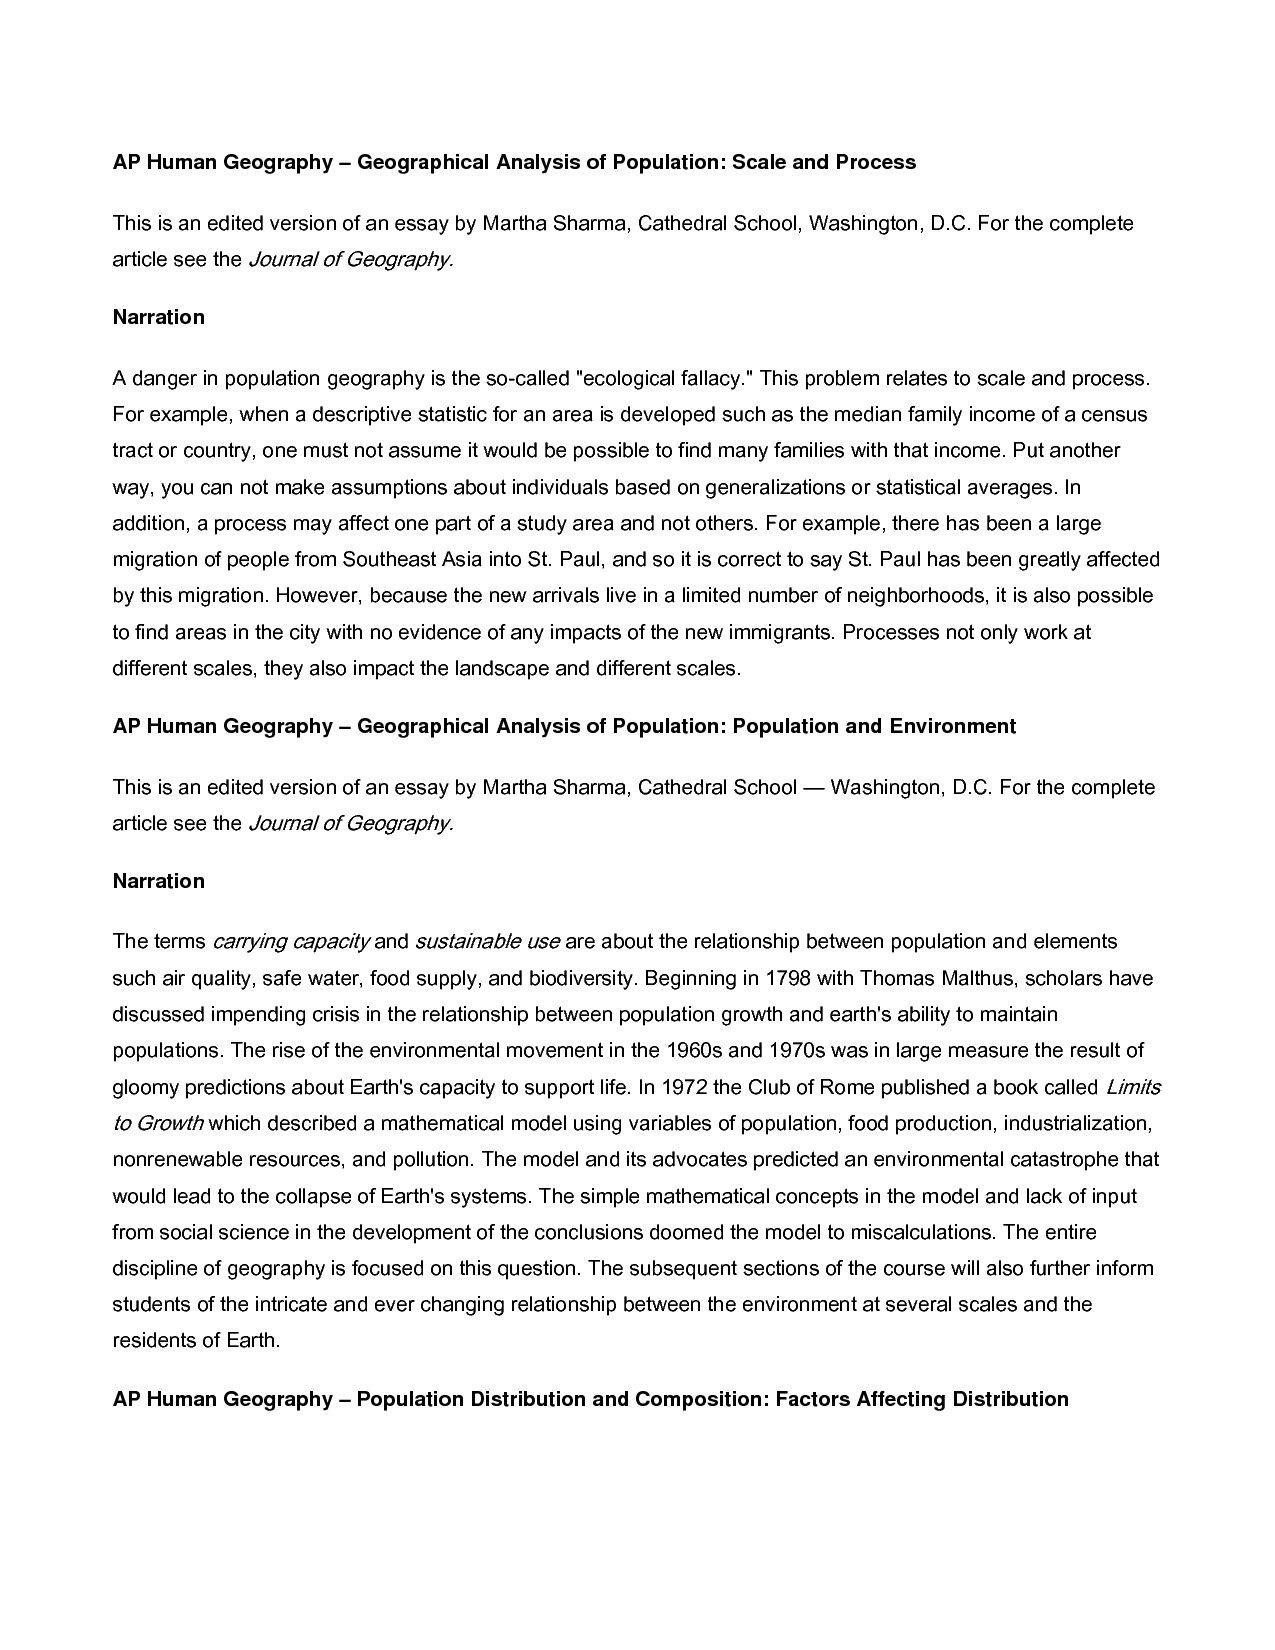 Gillette case study pdf